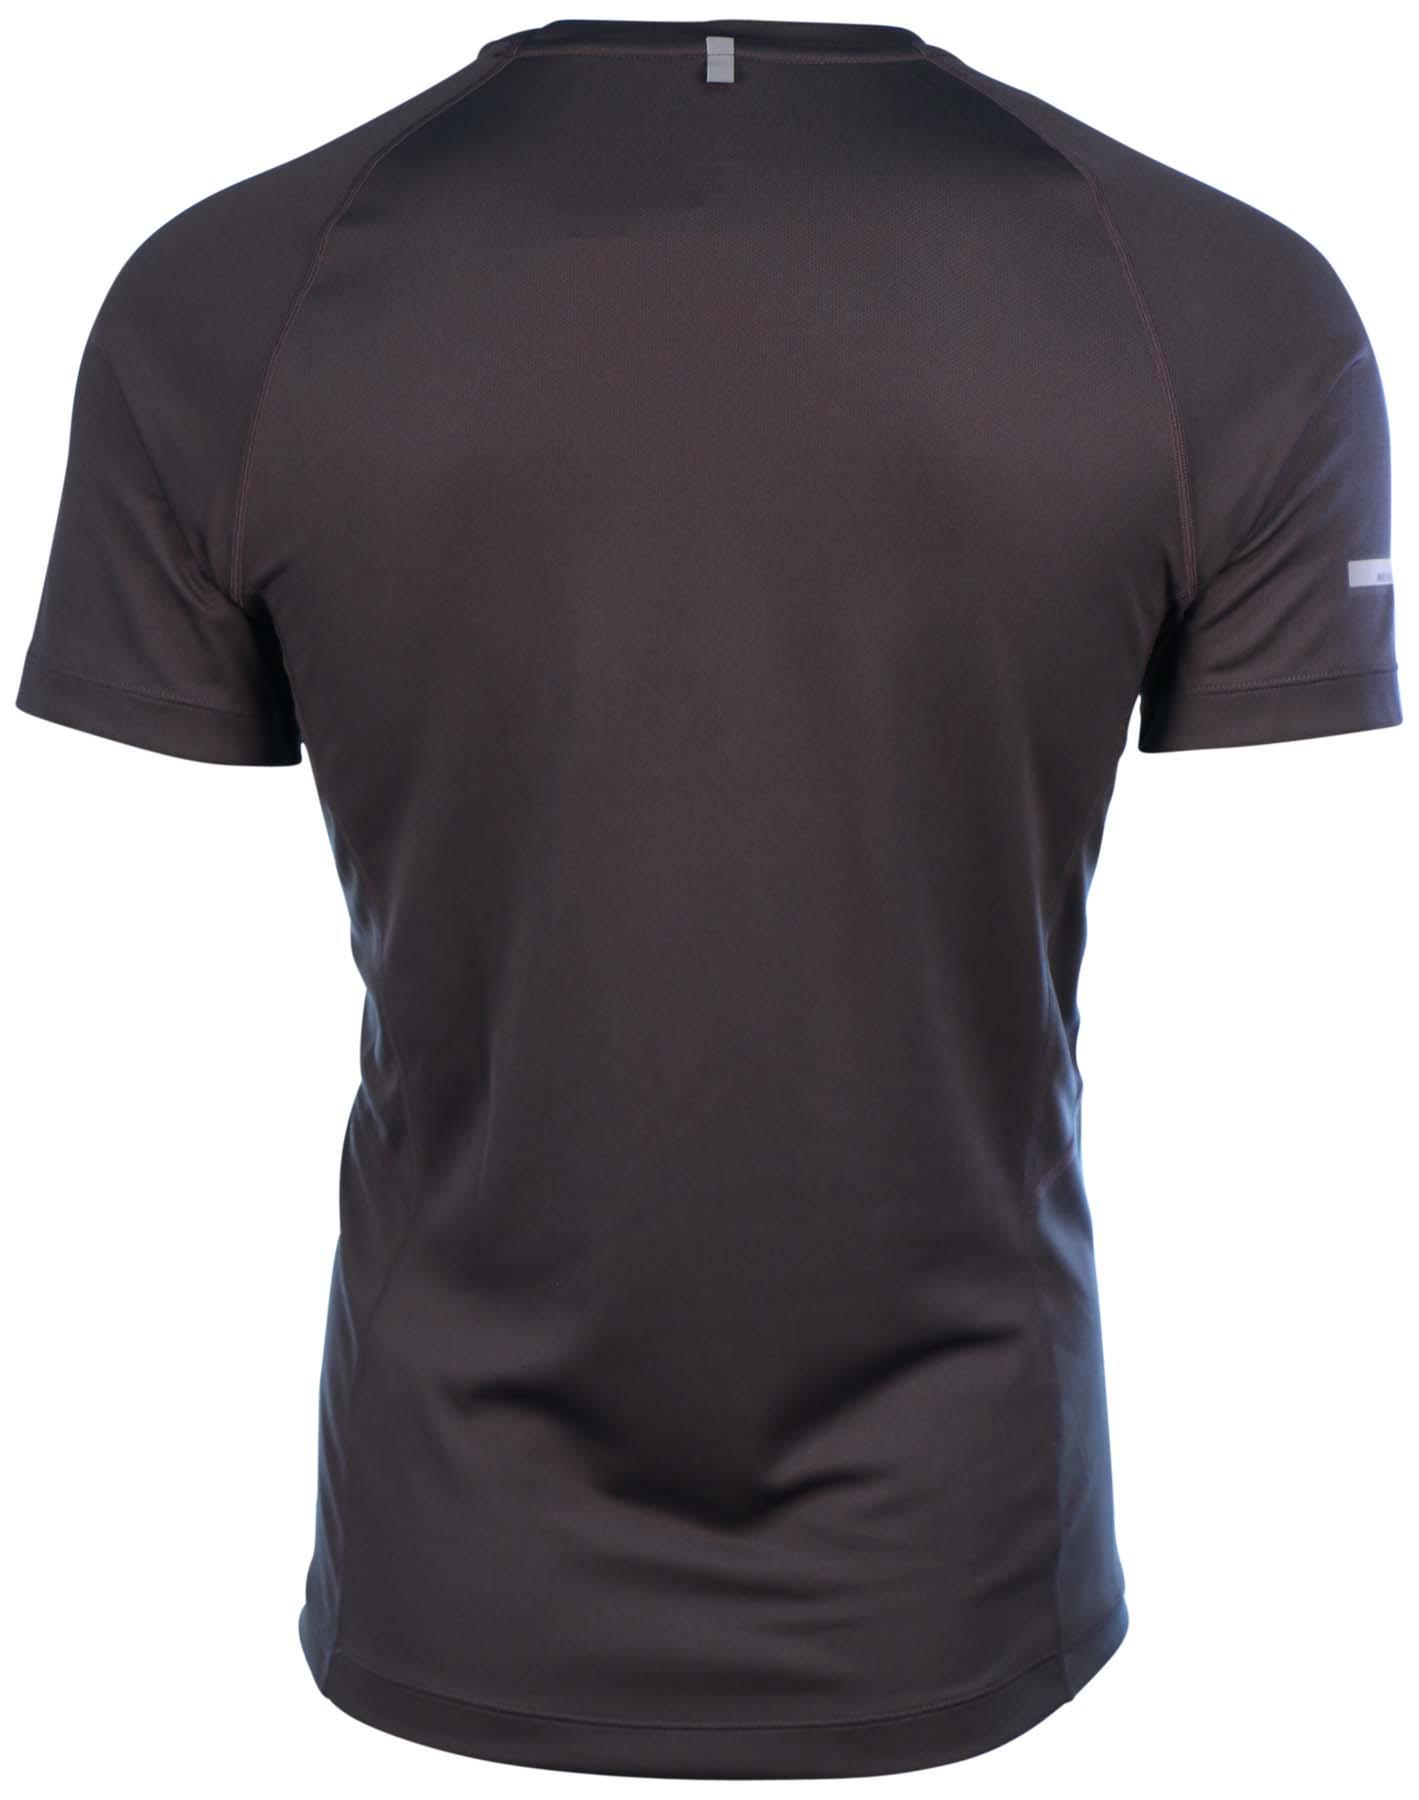 Nike Men 39 S Dri Fit Miler Uv Short Sleeve Running Shirt Ebay